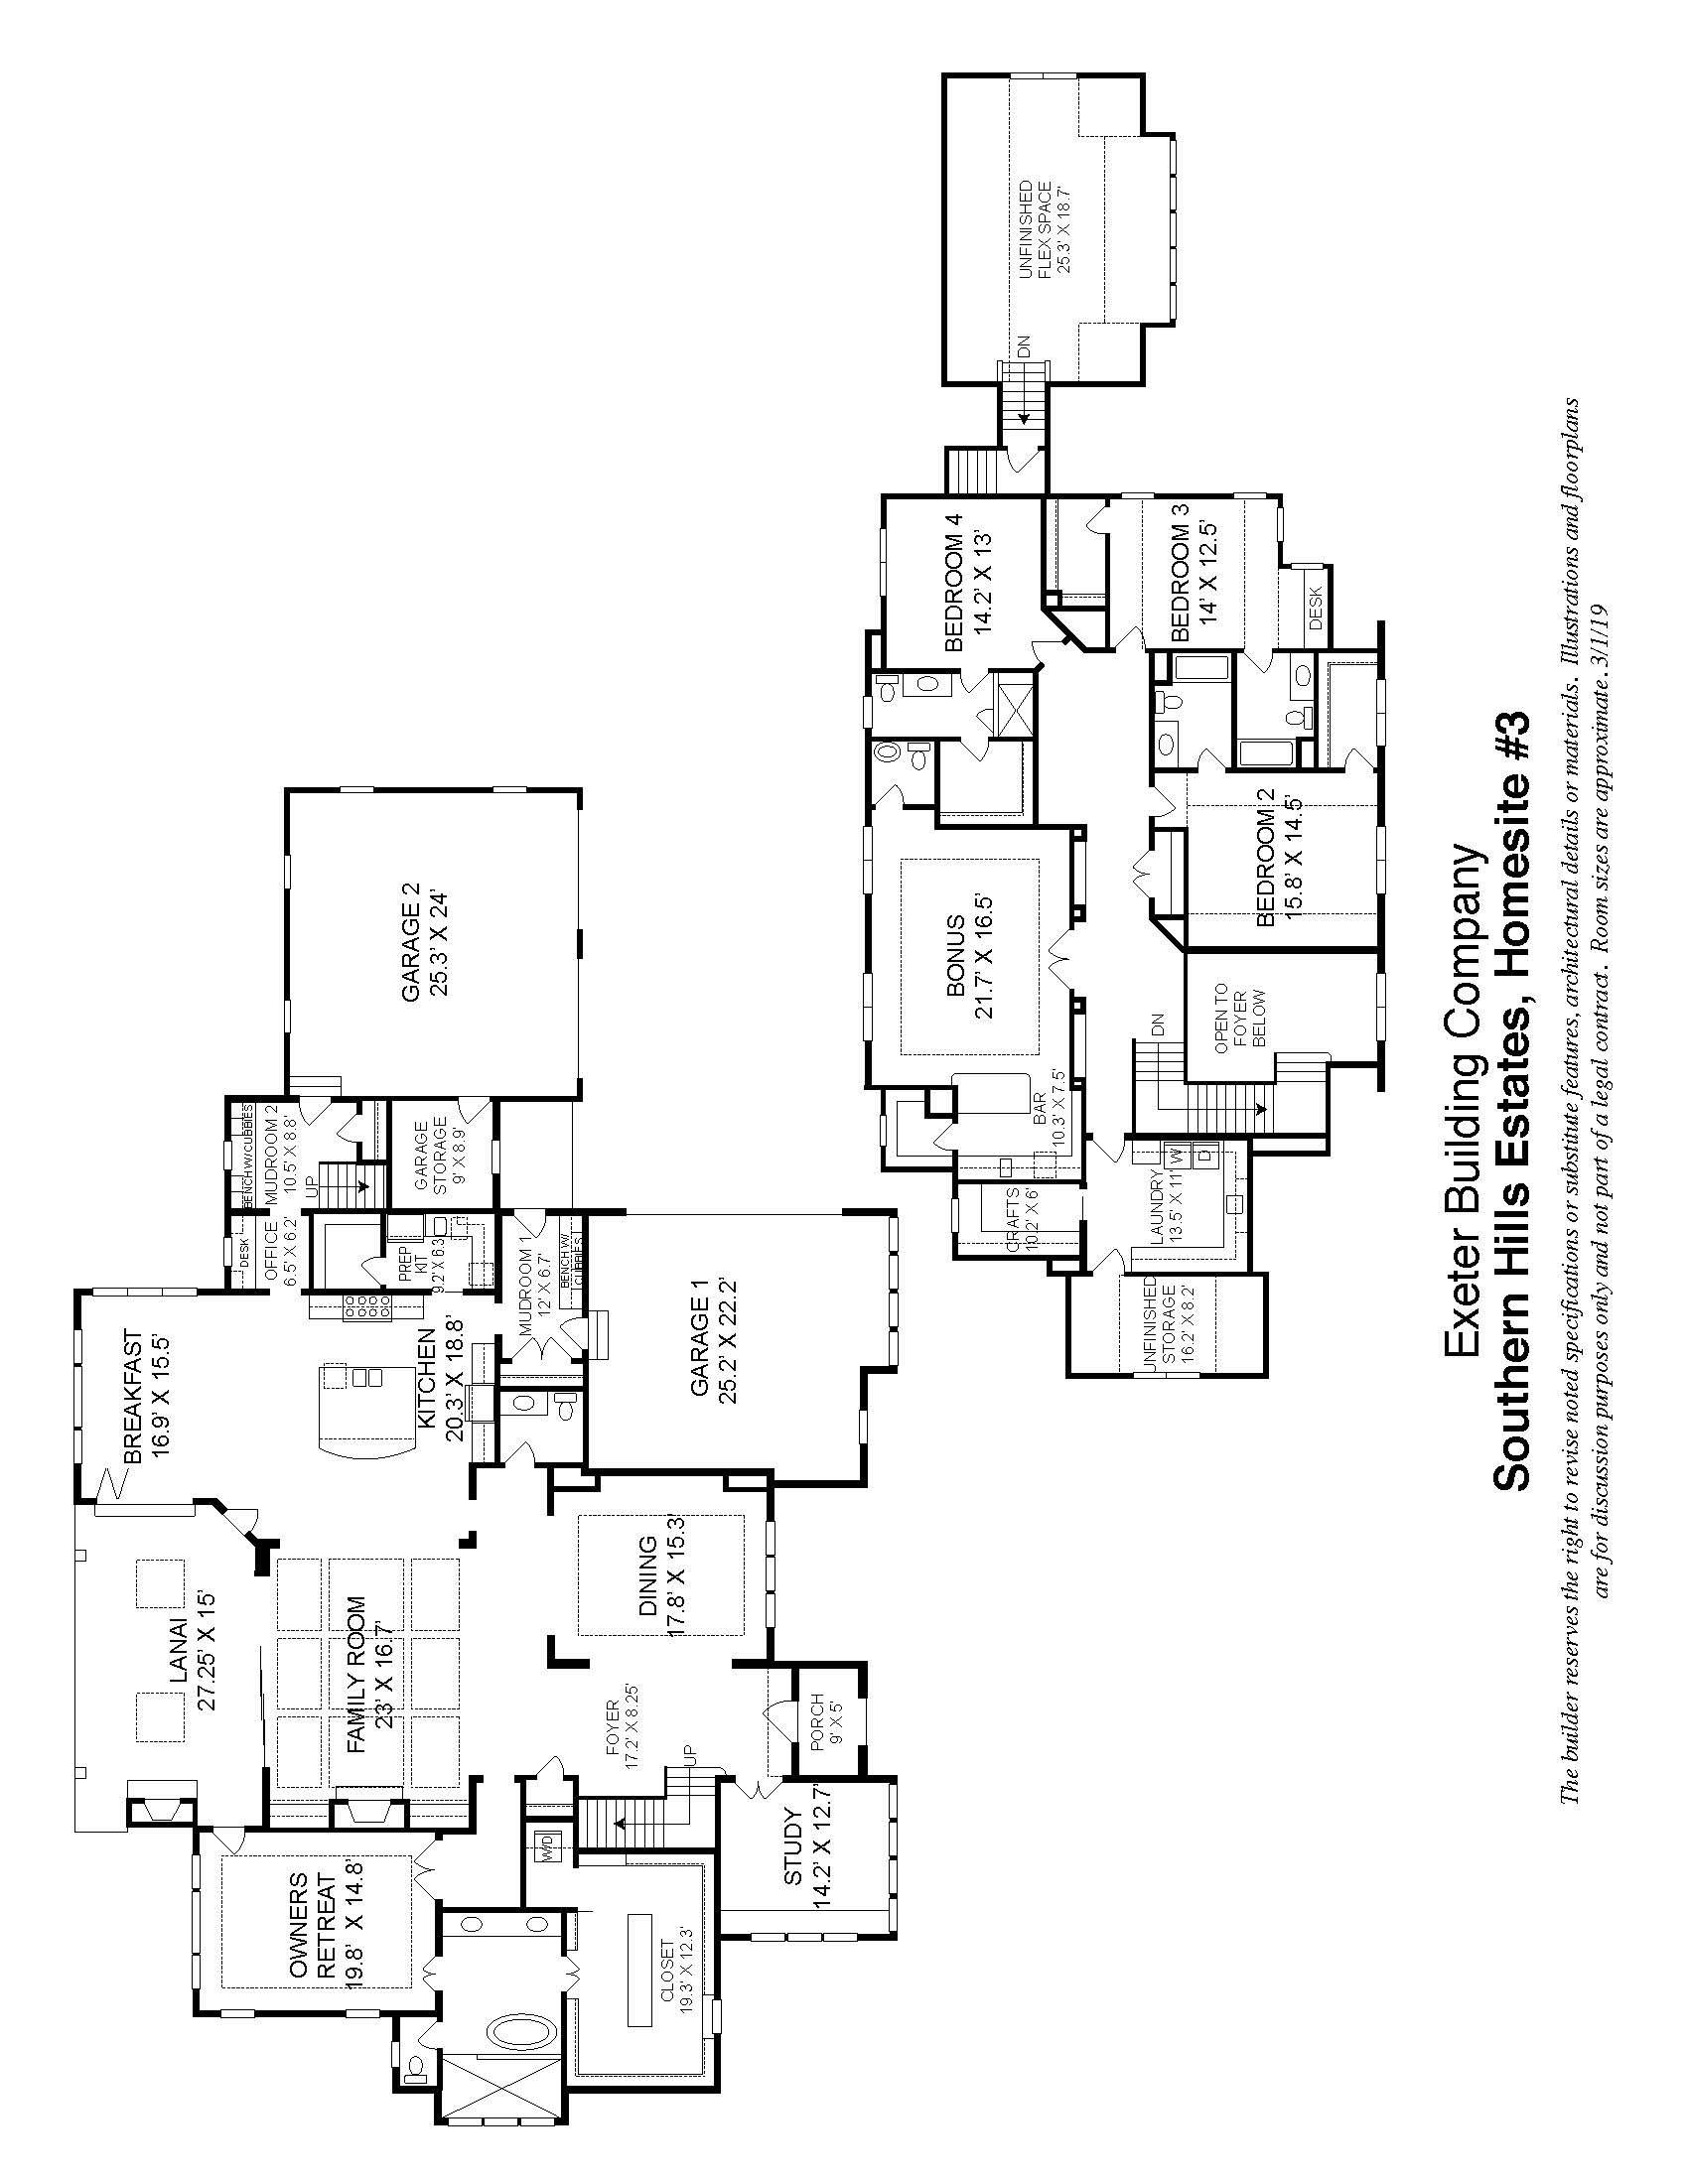 SHE-Cutsheet-Exeter-Lot3-10.15.19-web_Page_2.jpg